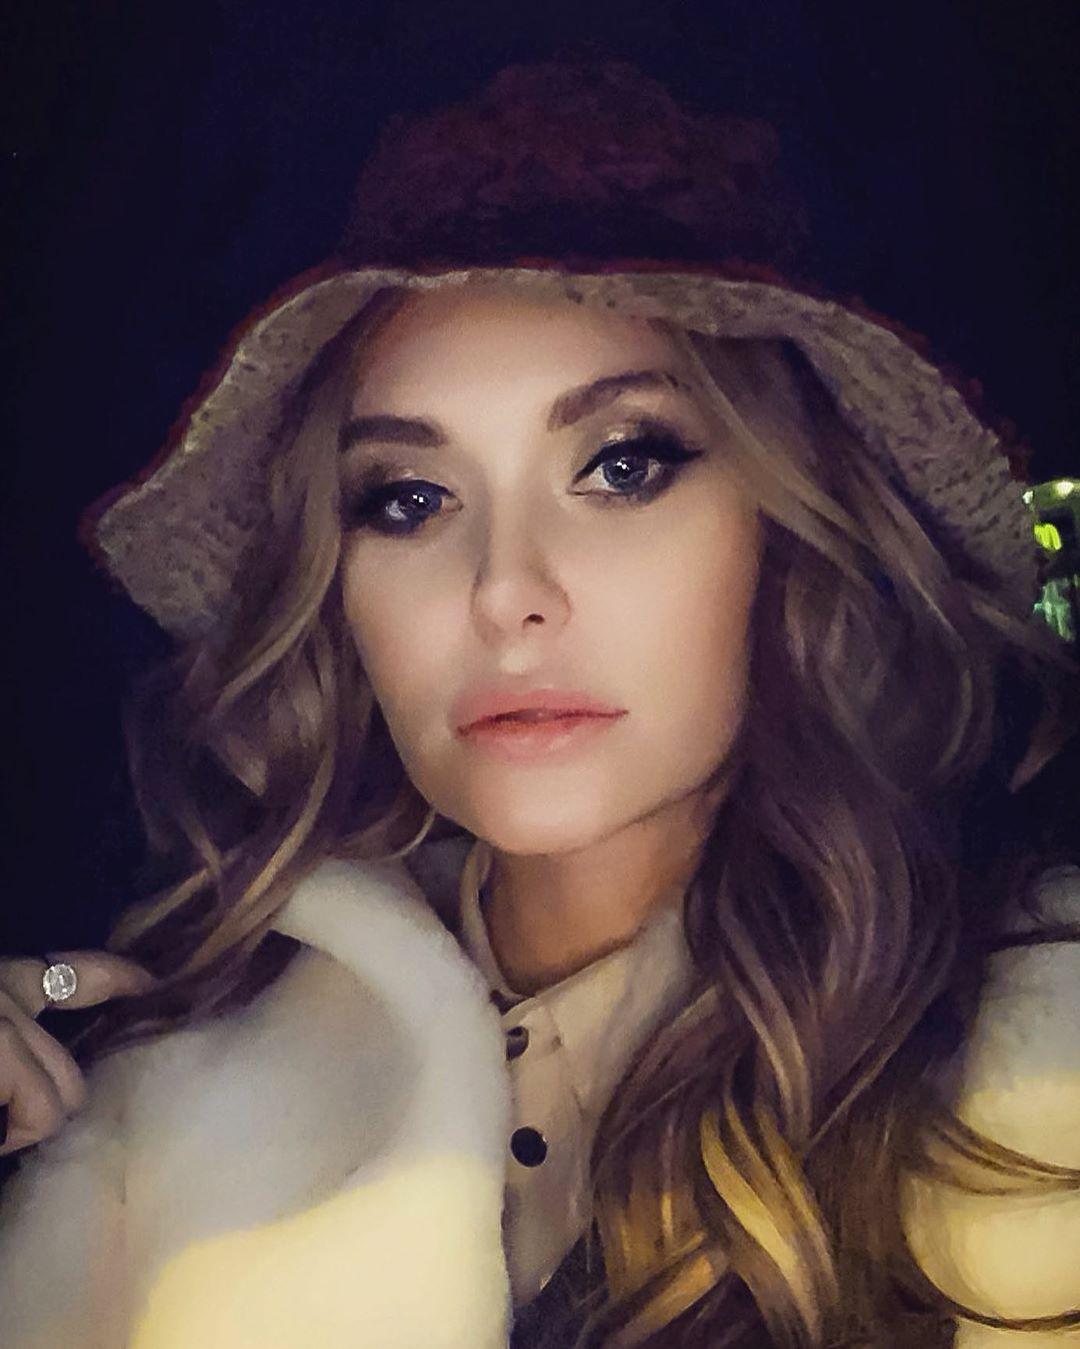 Слава Каминская поправилась из-за болезни - фото